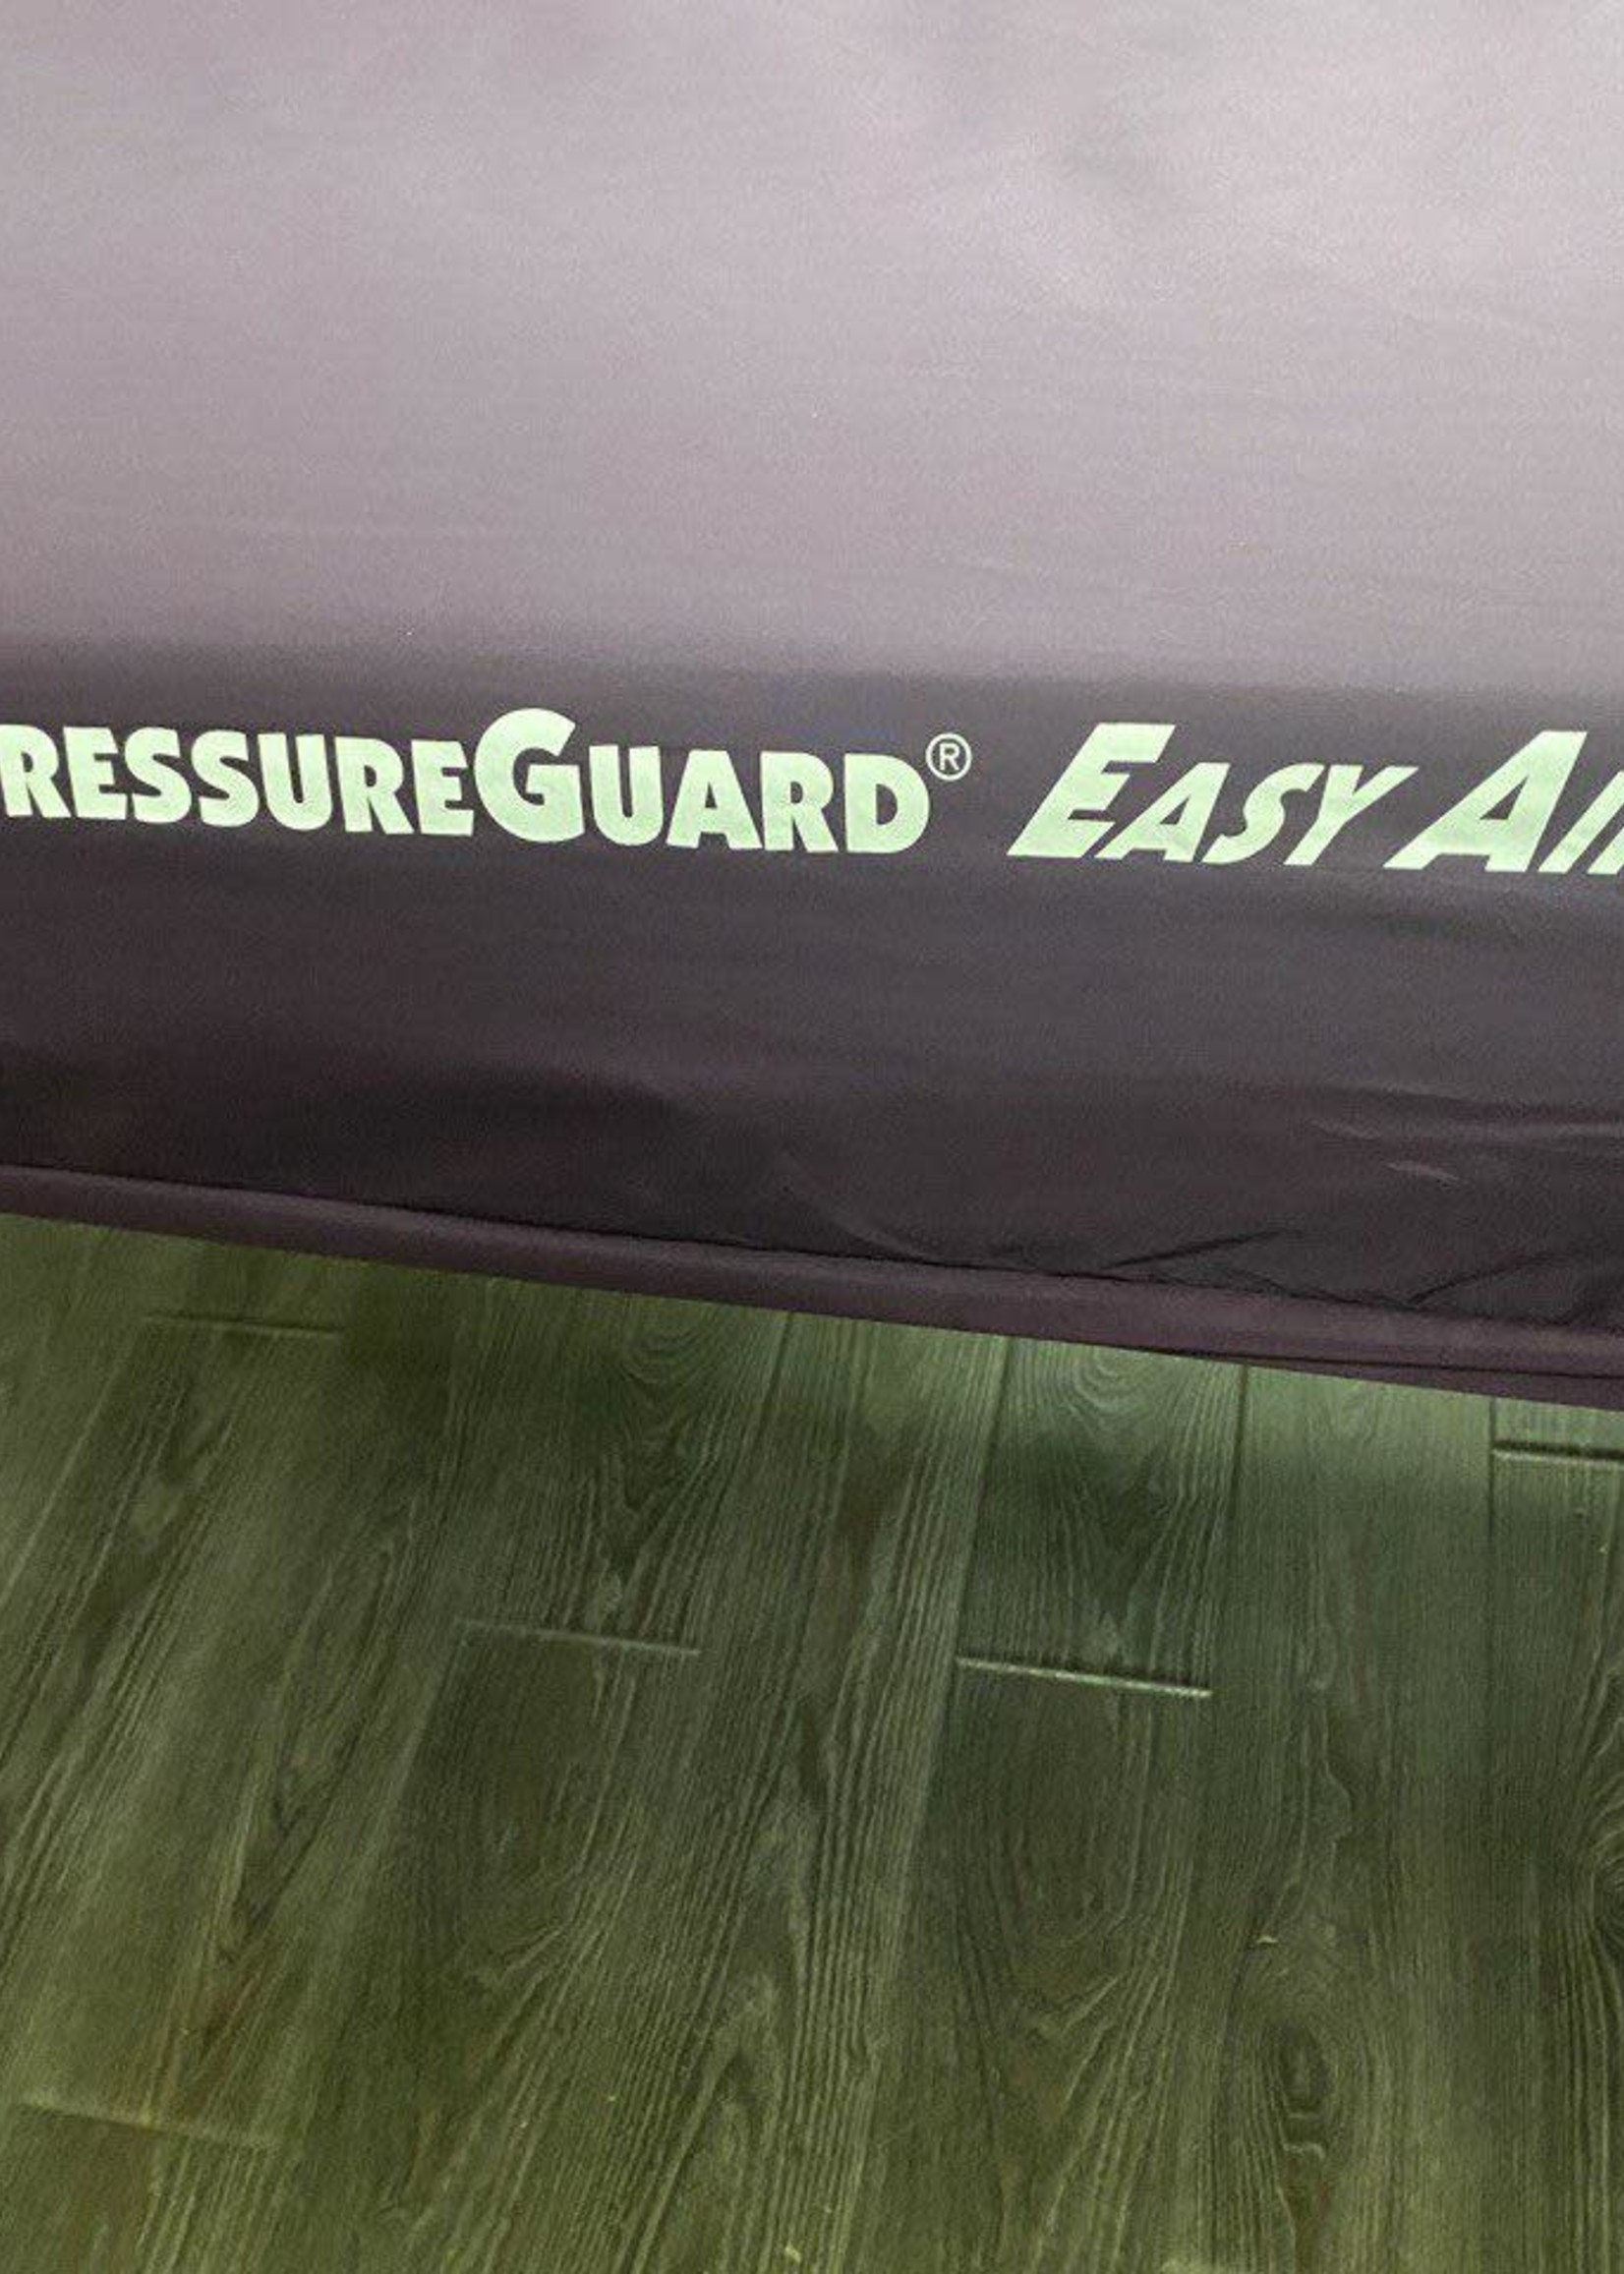 PressureGuard Easy Air LR Mattress (Used)